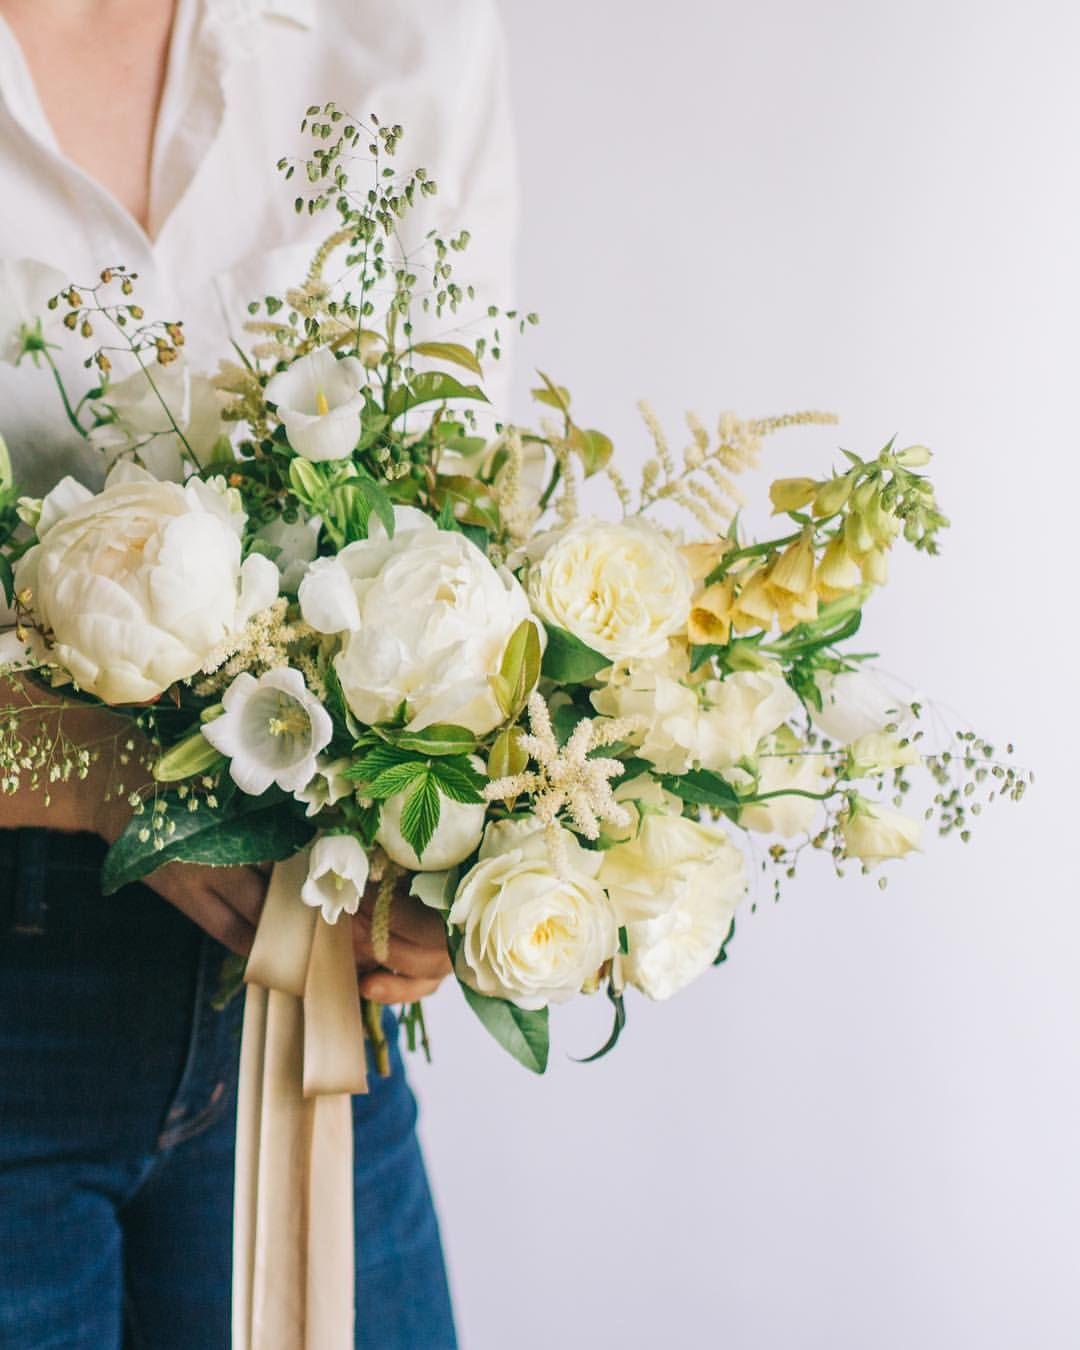 Beautiful Flowers For Weddings: For Roxy #weddingbouquet #bridalbouquet #flowers #white